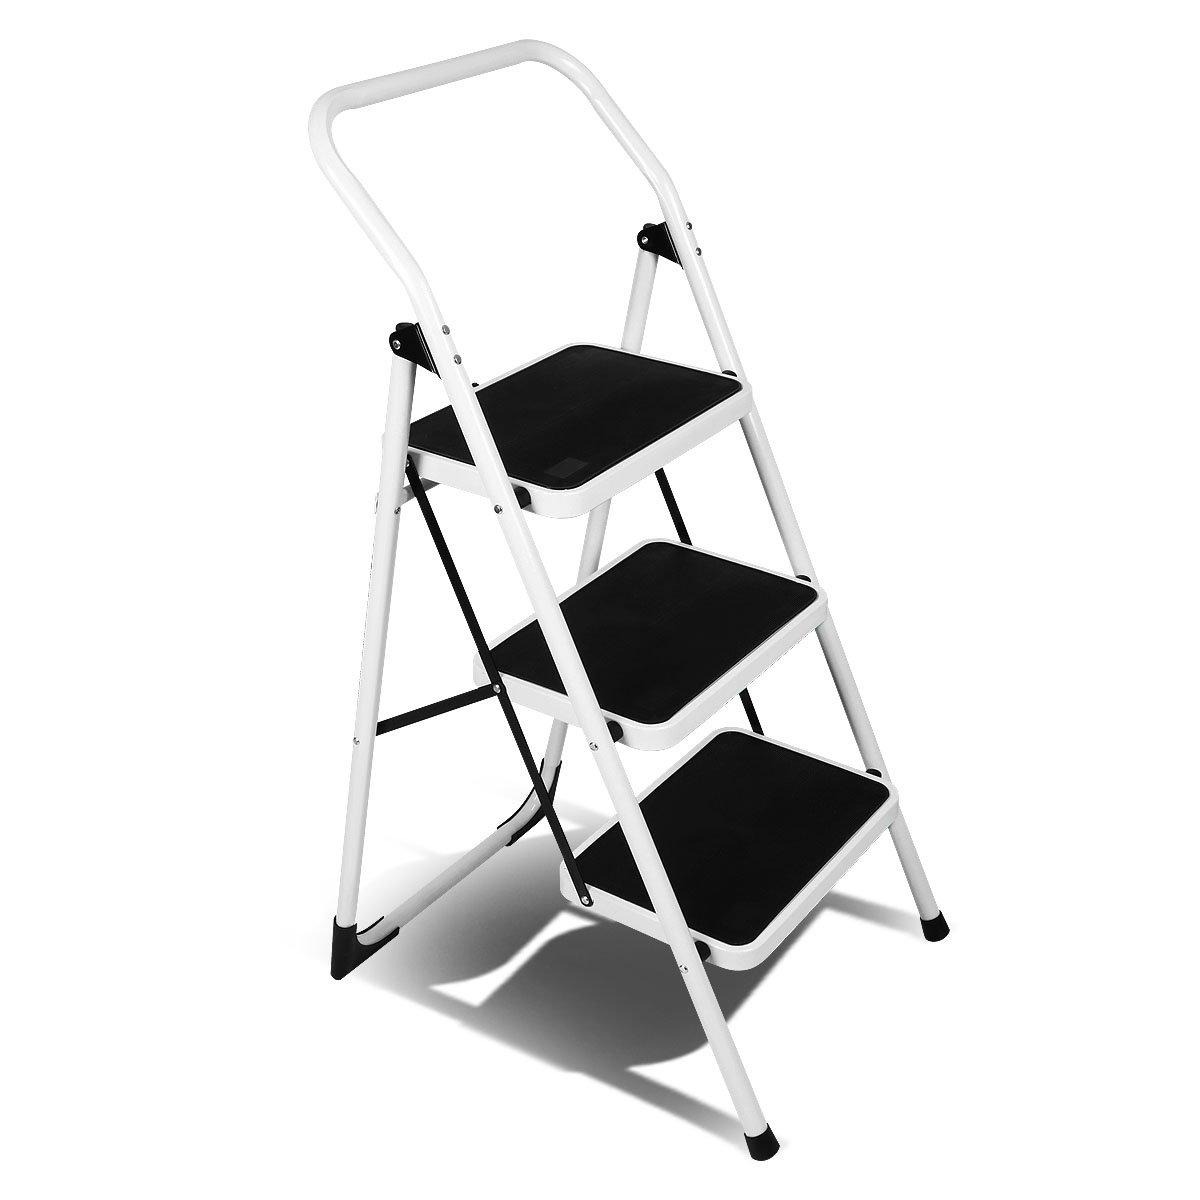 Magshion 3 Step Ladder Platform Lightweight Folding Stool Heavy Duty Industrial Safety Space Saving